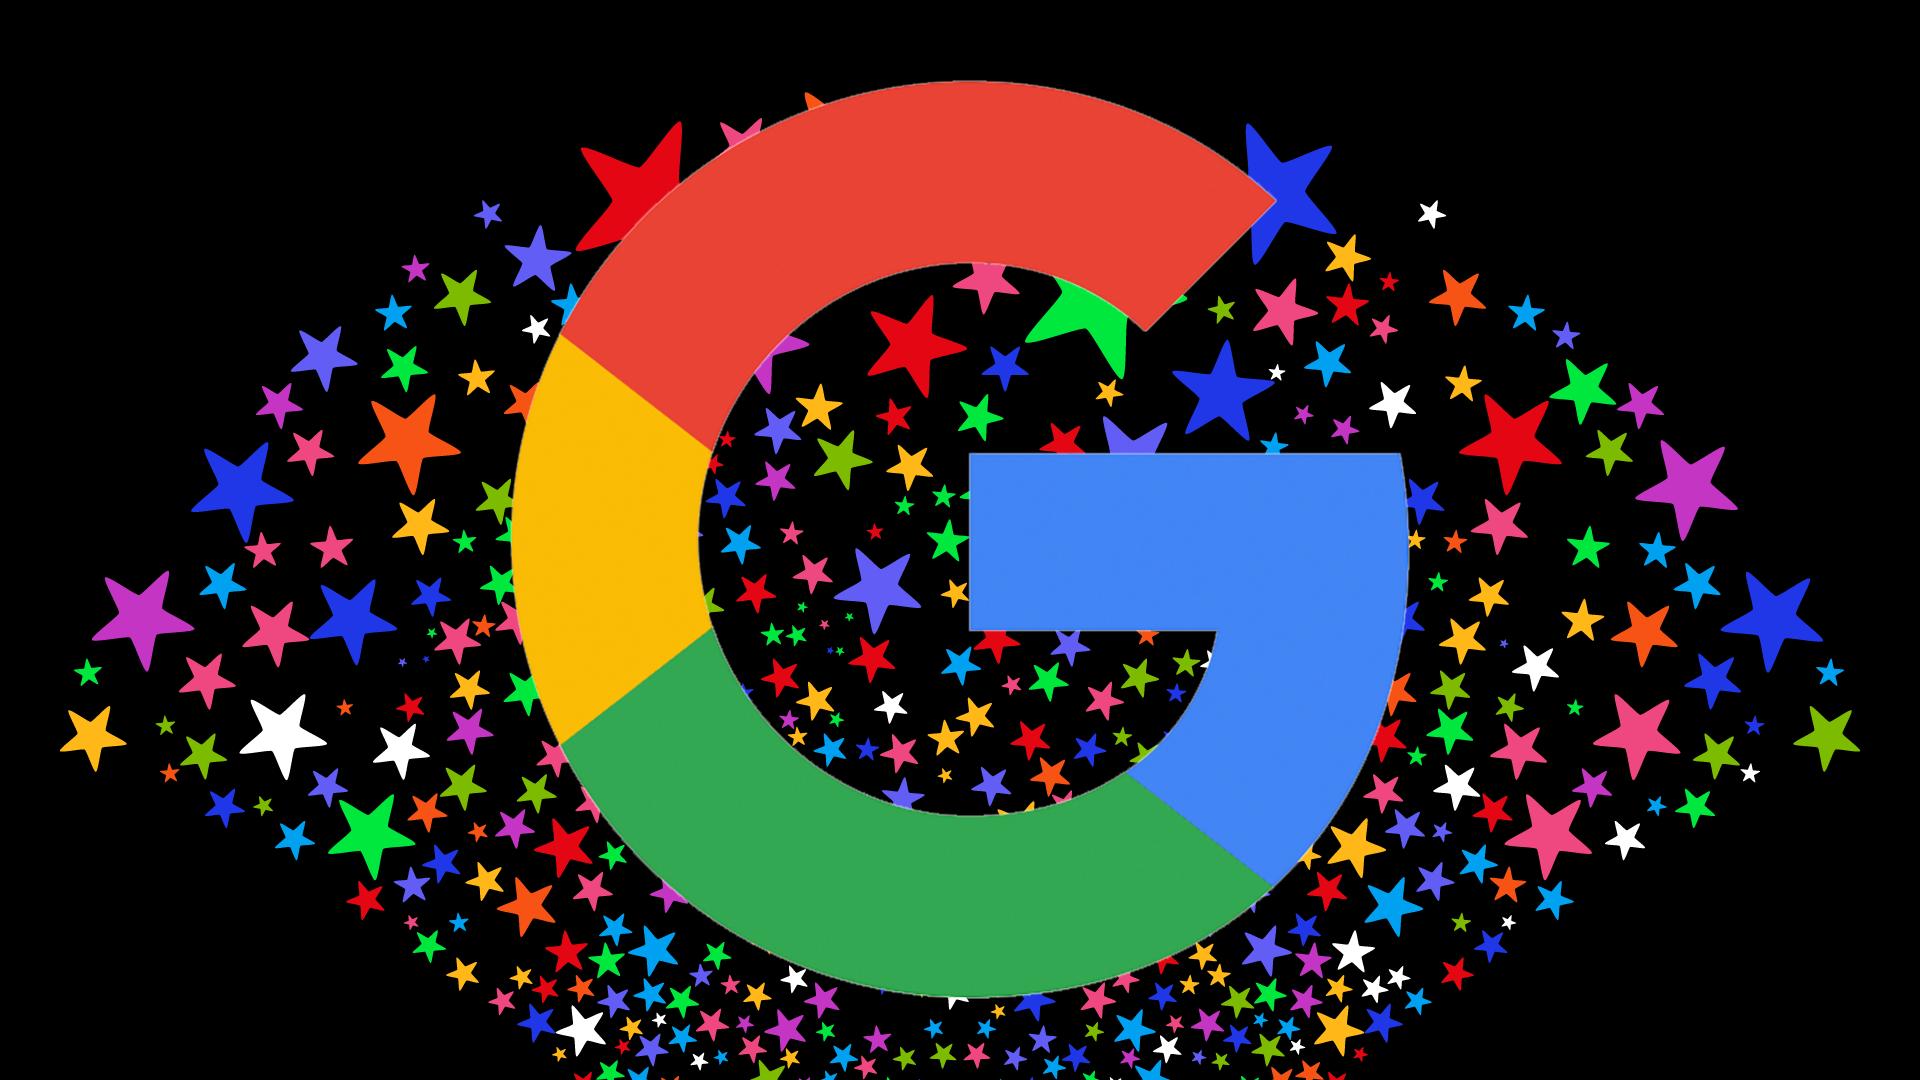 google-stars-reviews-rankings6-ss-1920